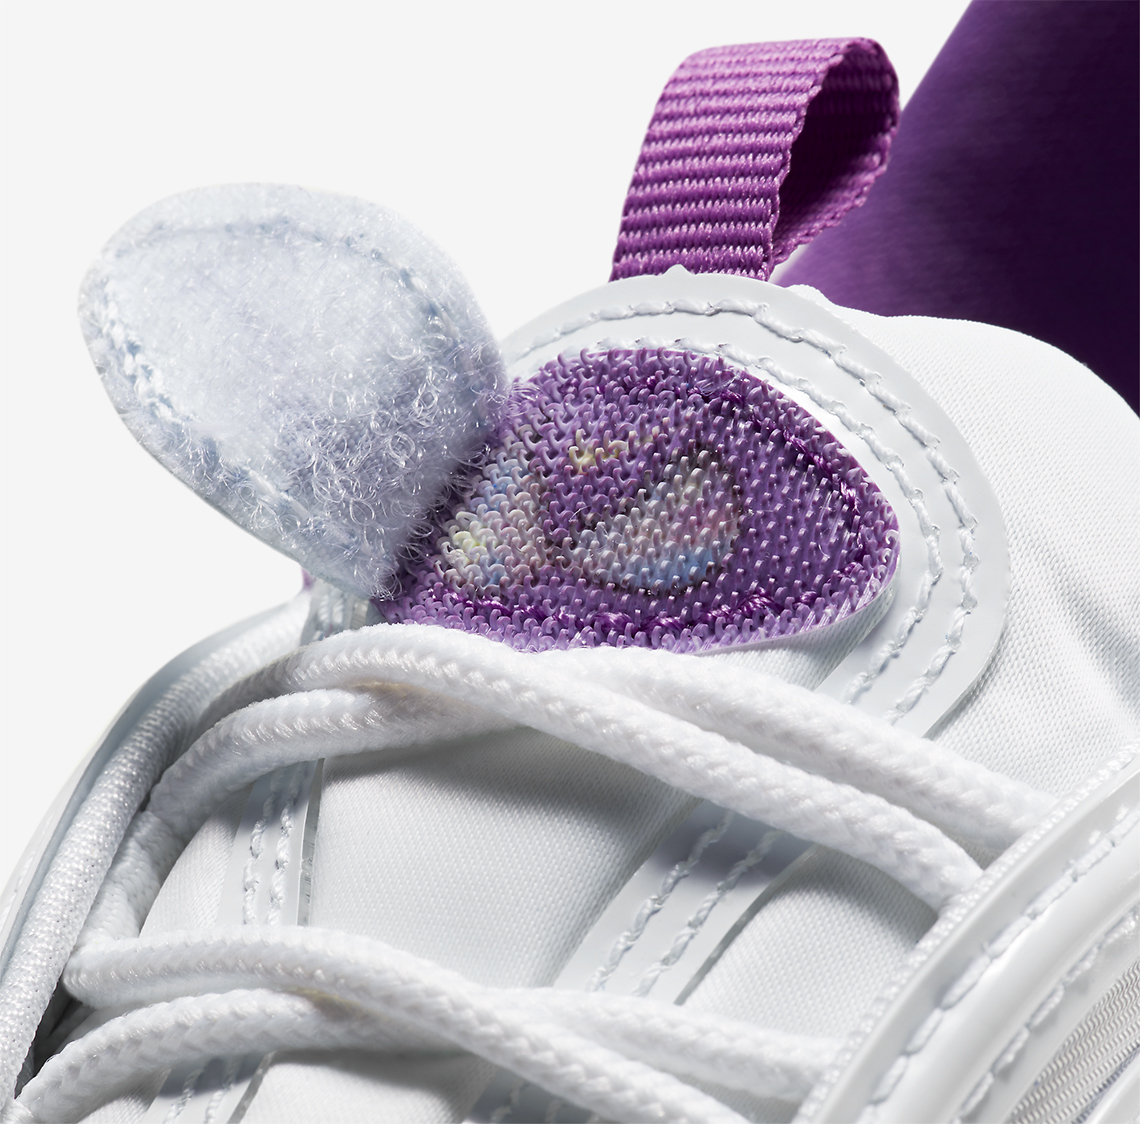 Nike Air Max 97 Easter Blanc Violet CJ0591 100 Crumpe